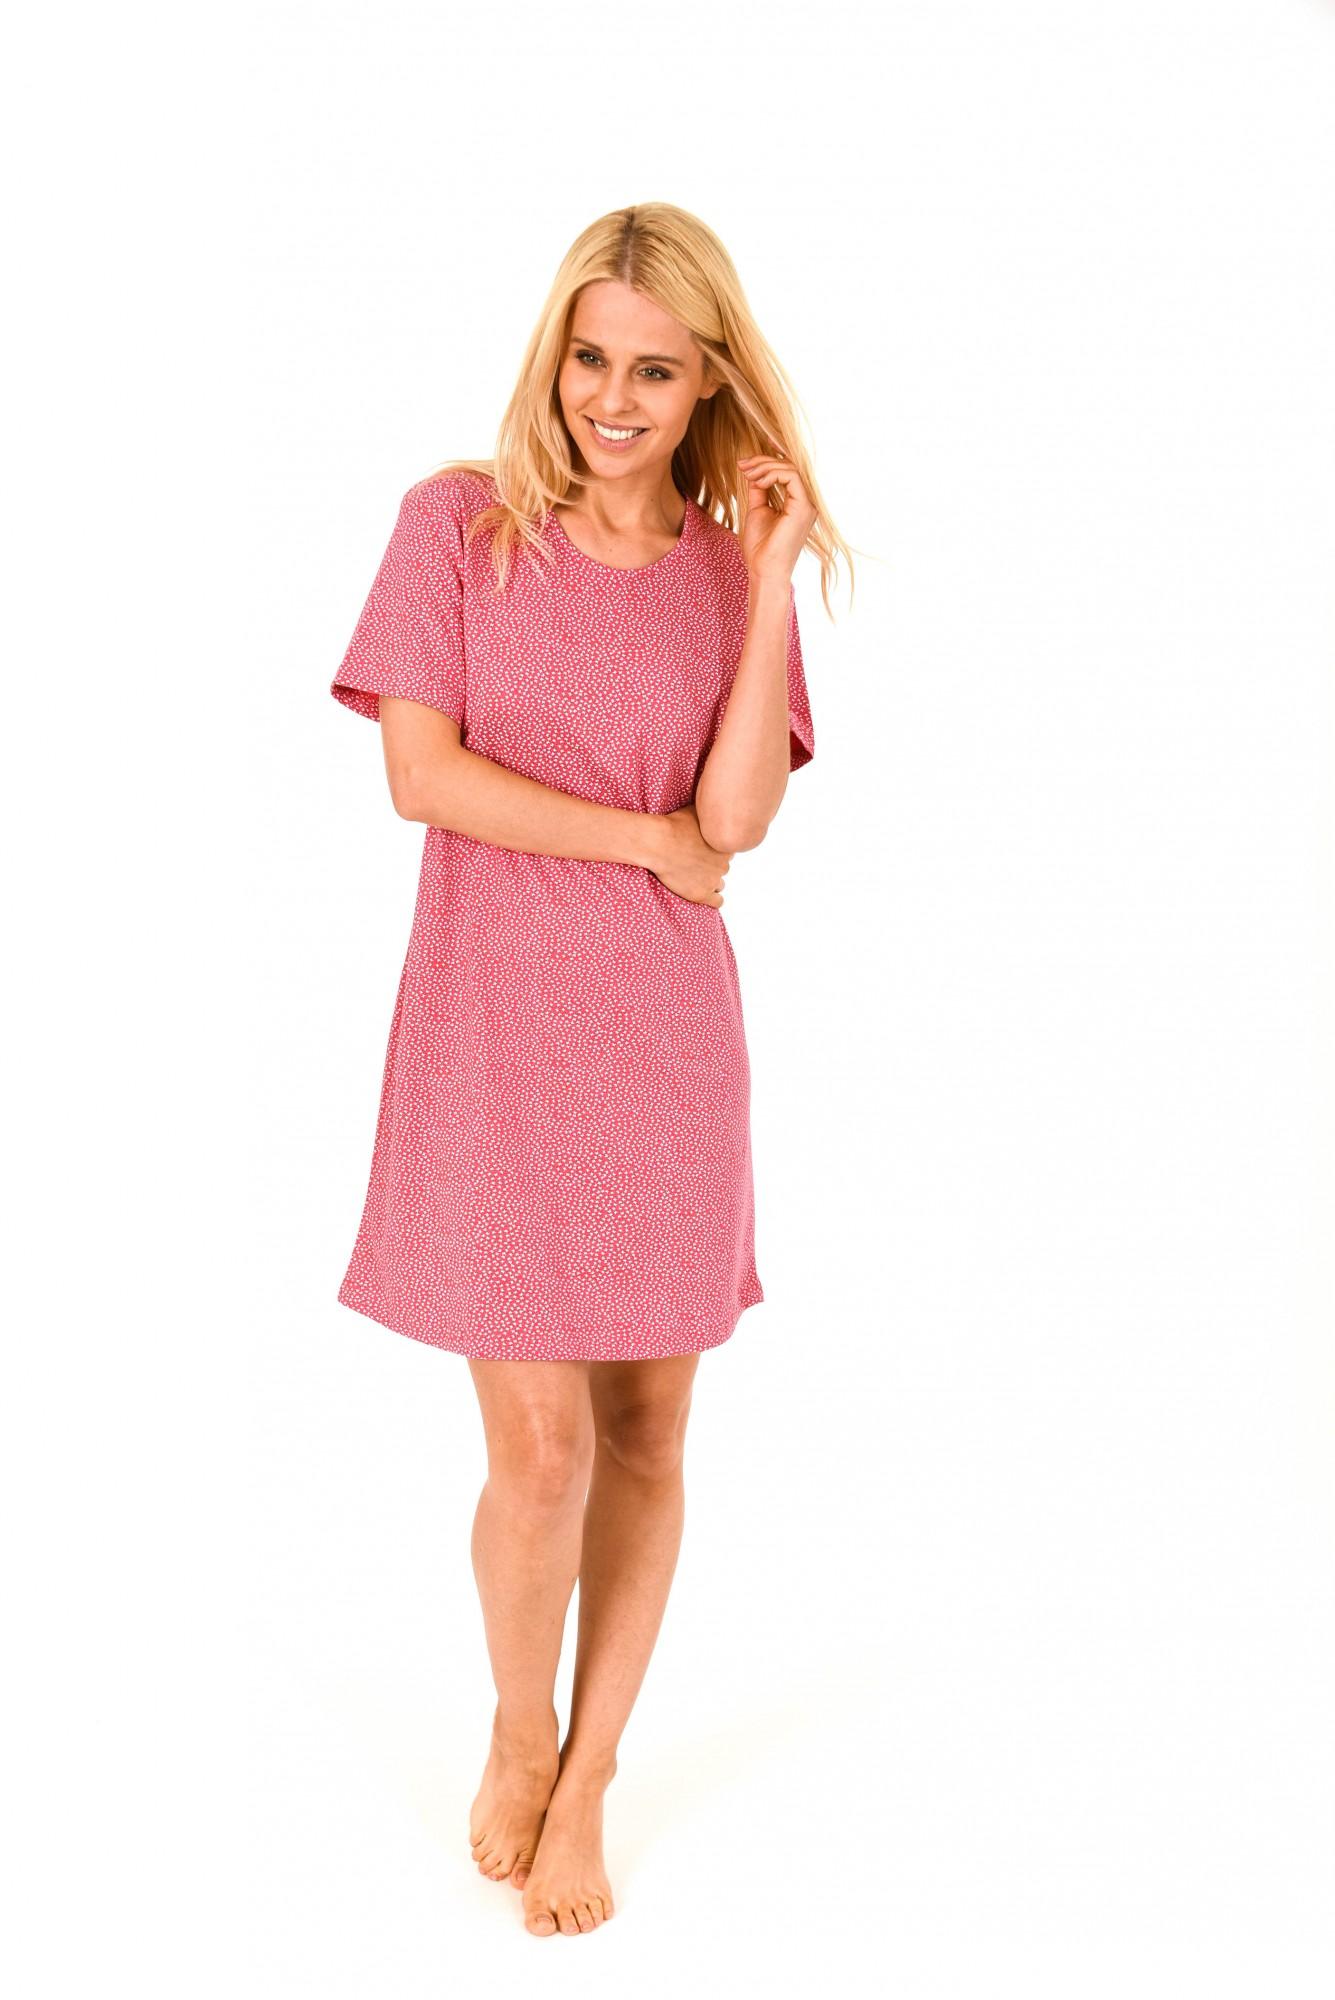 Damen Bigshirt kurzarm Nachthemd mit Minimalprint – 171 213 90 904